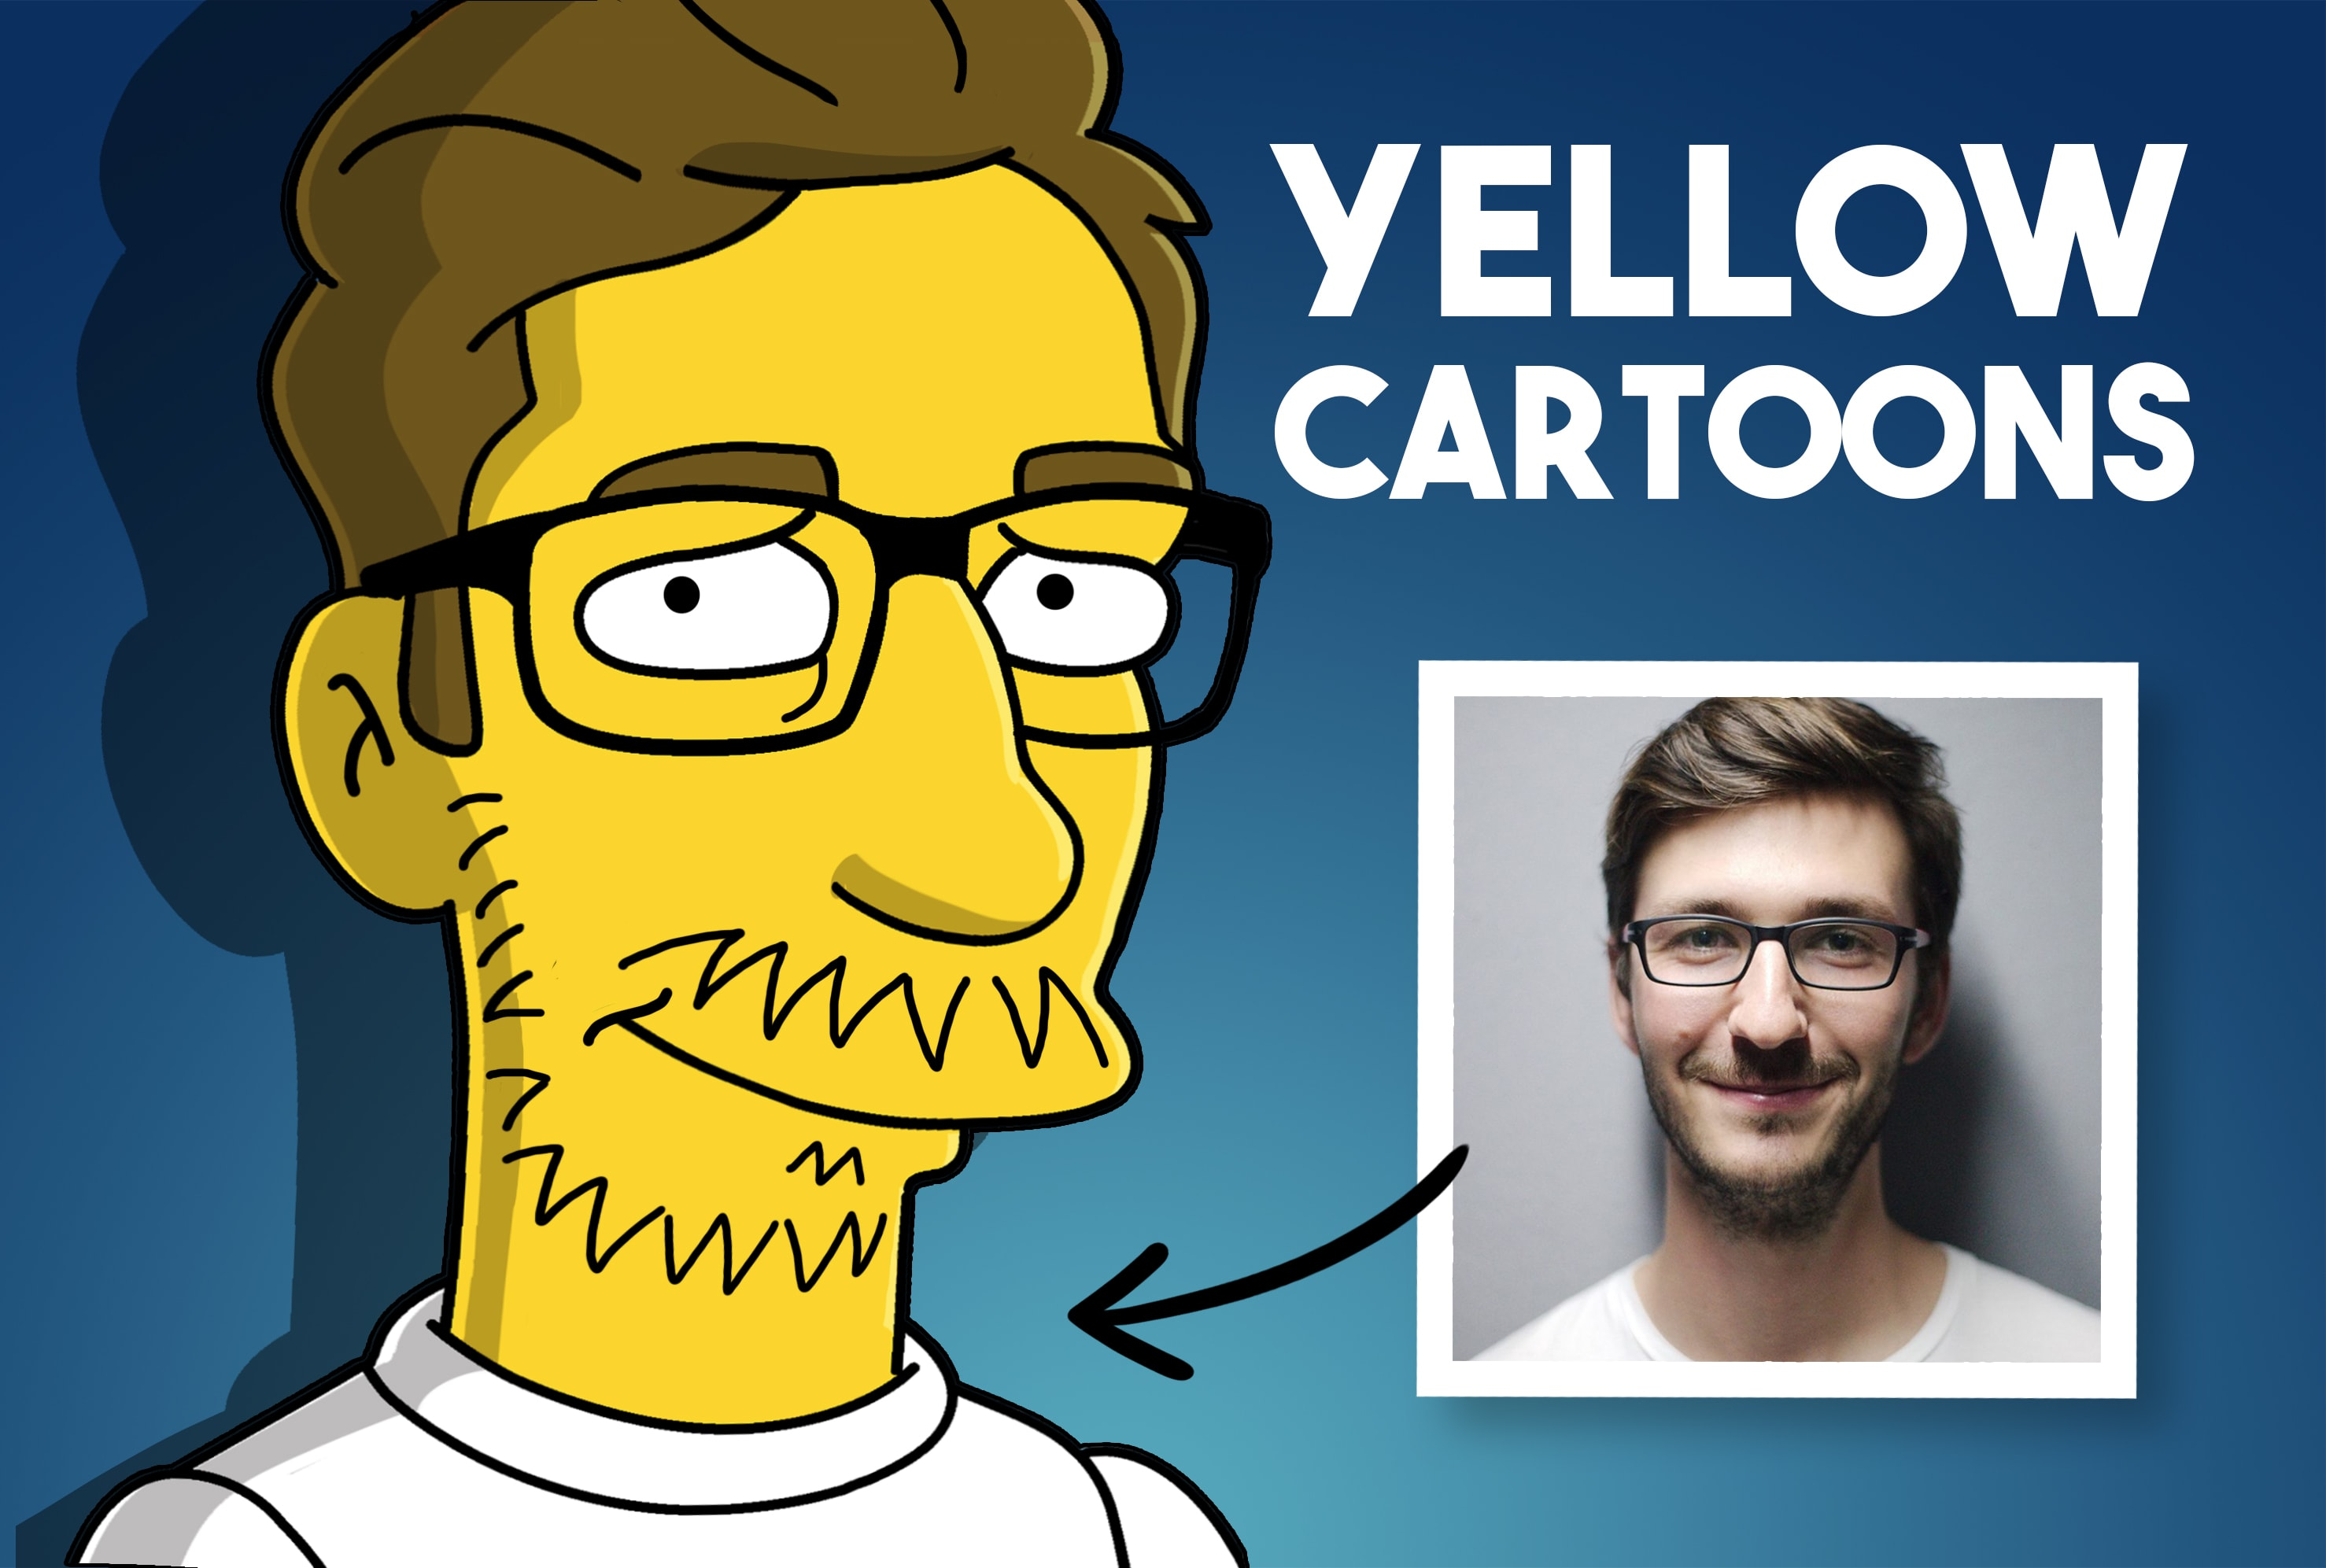 Draw you as a yellow cartoon by Eliana93fer